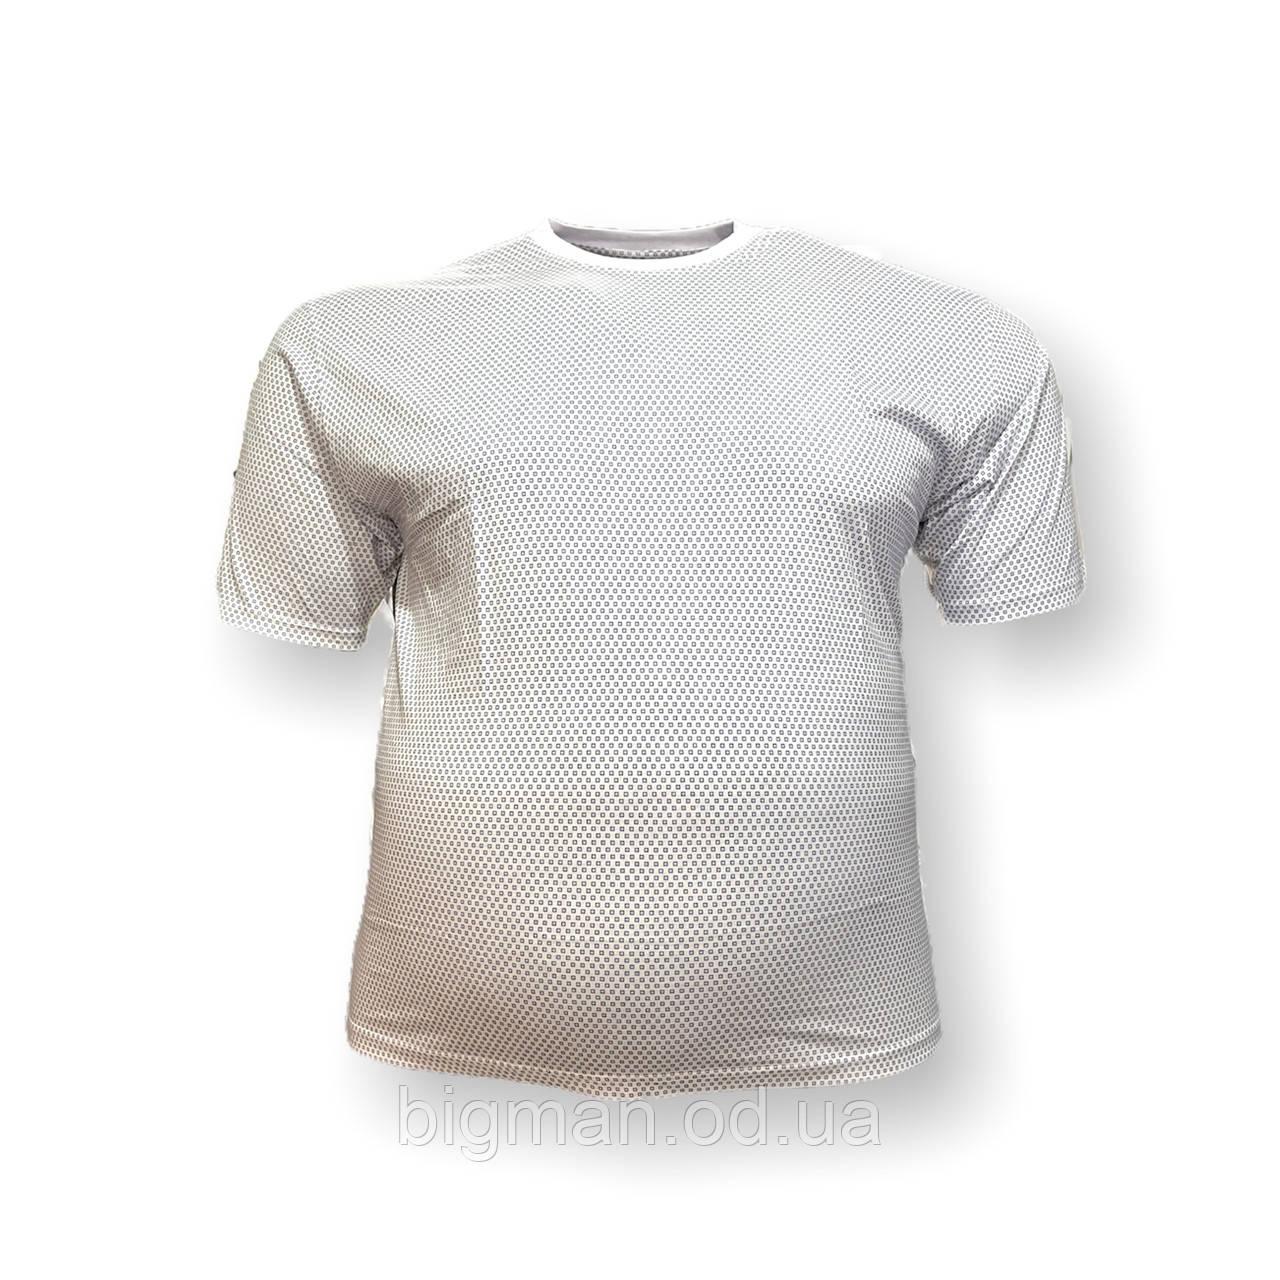 Мужская батальная футболка Borcan 12108 3XL 4XL 5XL 6XL белая большие размеры Турция